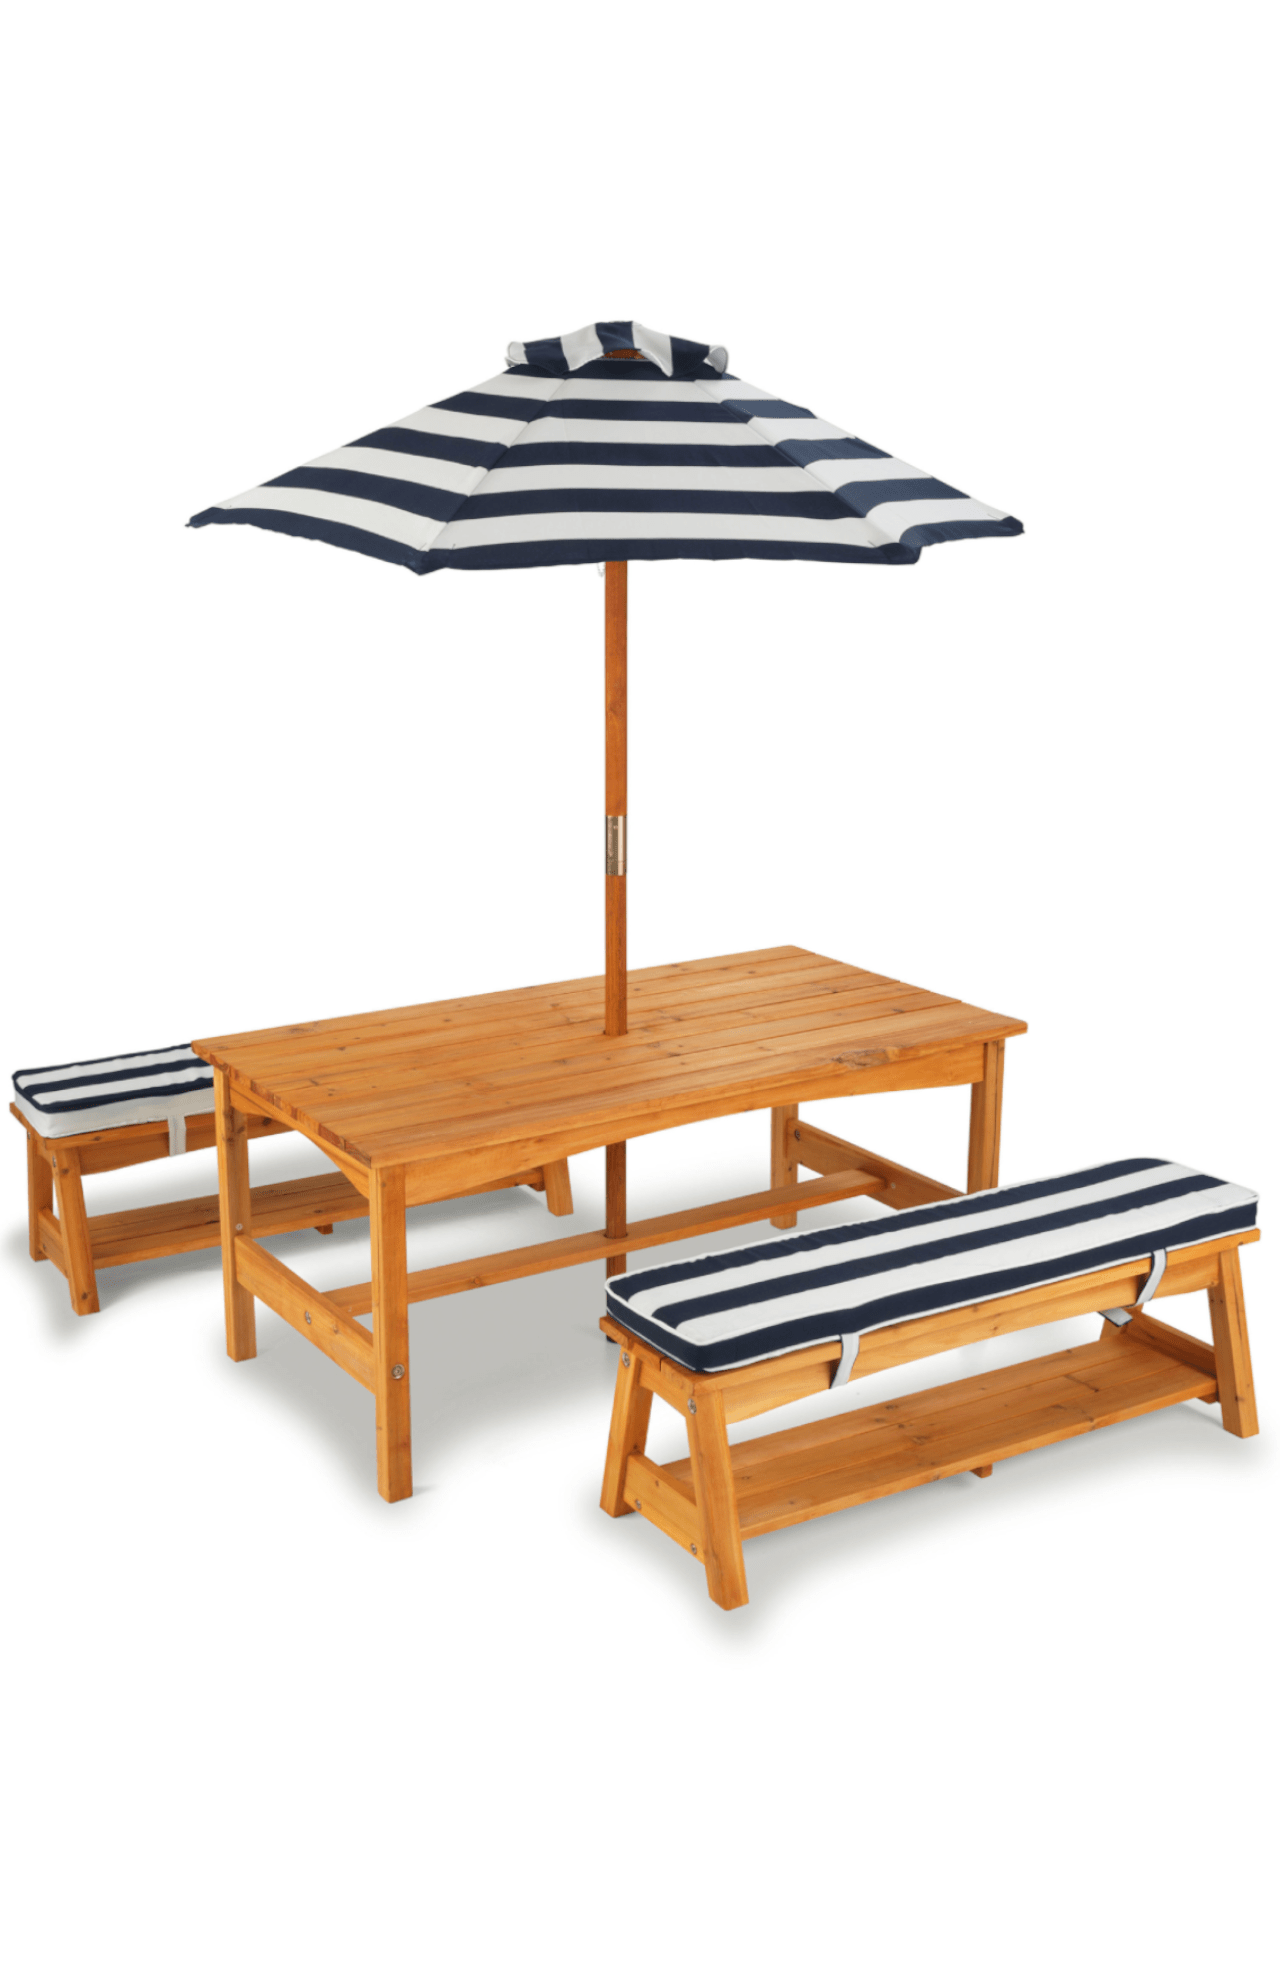 Miraculous Kidkraft Table And Bench Set Navy Kids Garden Outdoor Machost Co Dining Chair Design Ideas Machostcouk